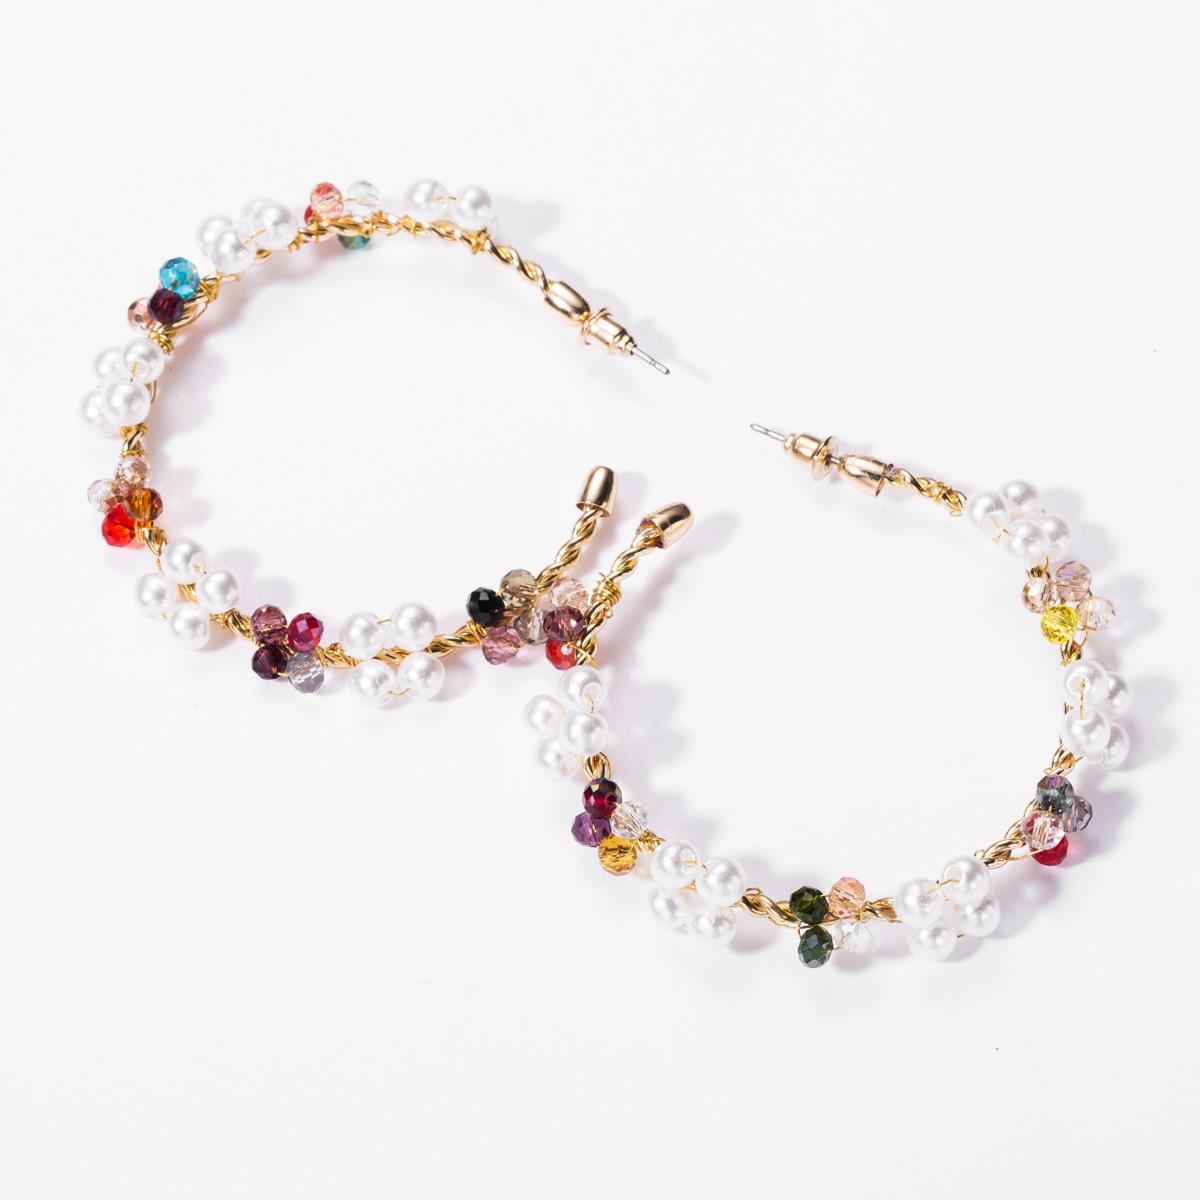 Fashion notched ring imitation pearl glass beads beaded woven earrings female retro boho style earrings NHJE176138